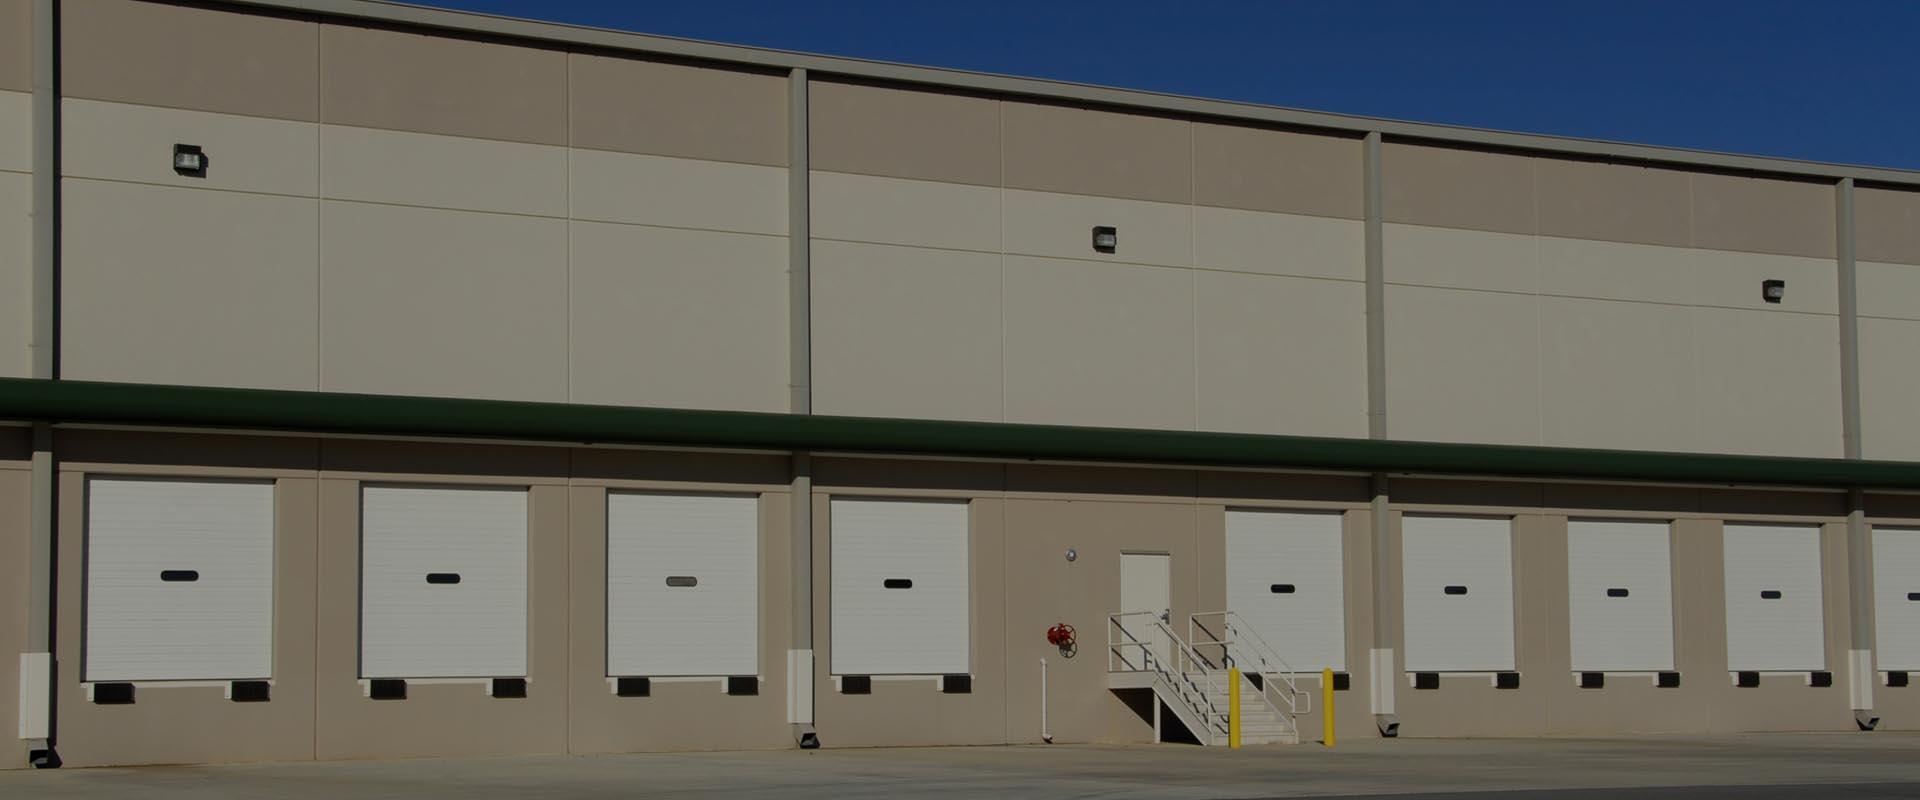 Tan loading area of building